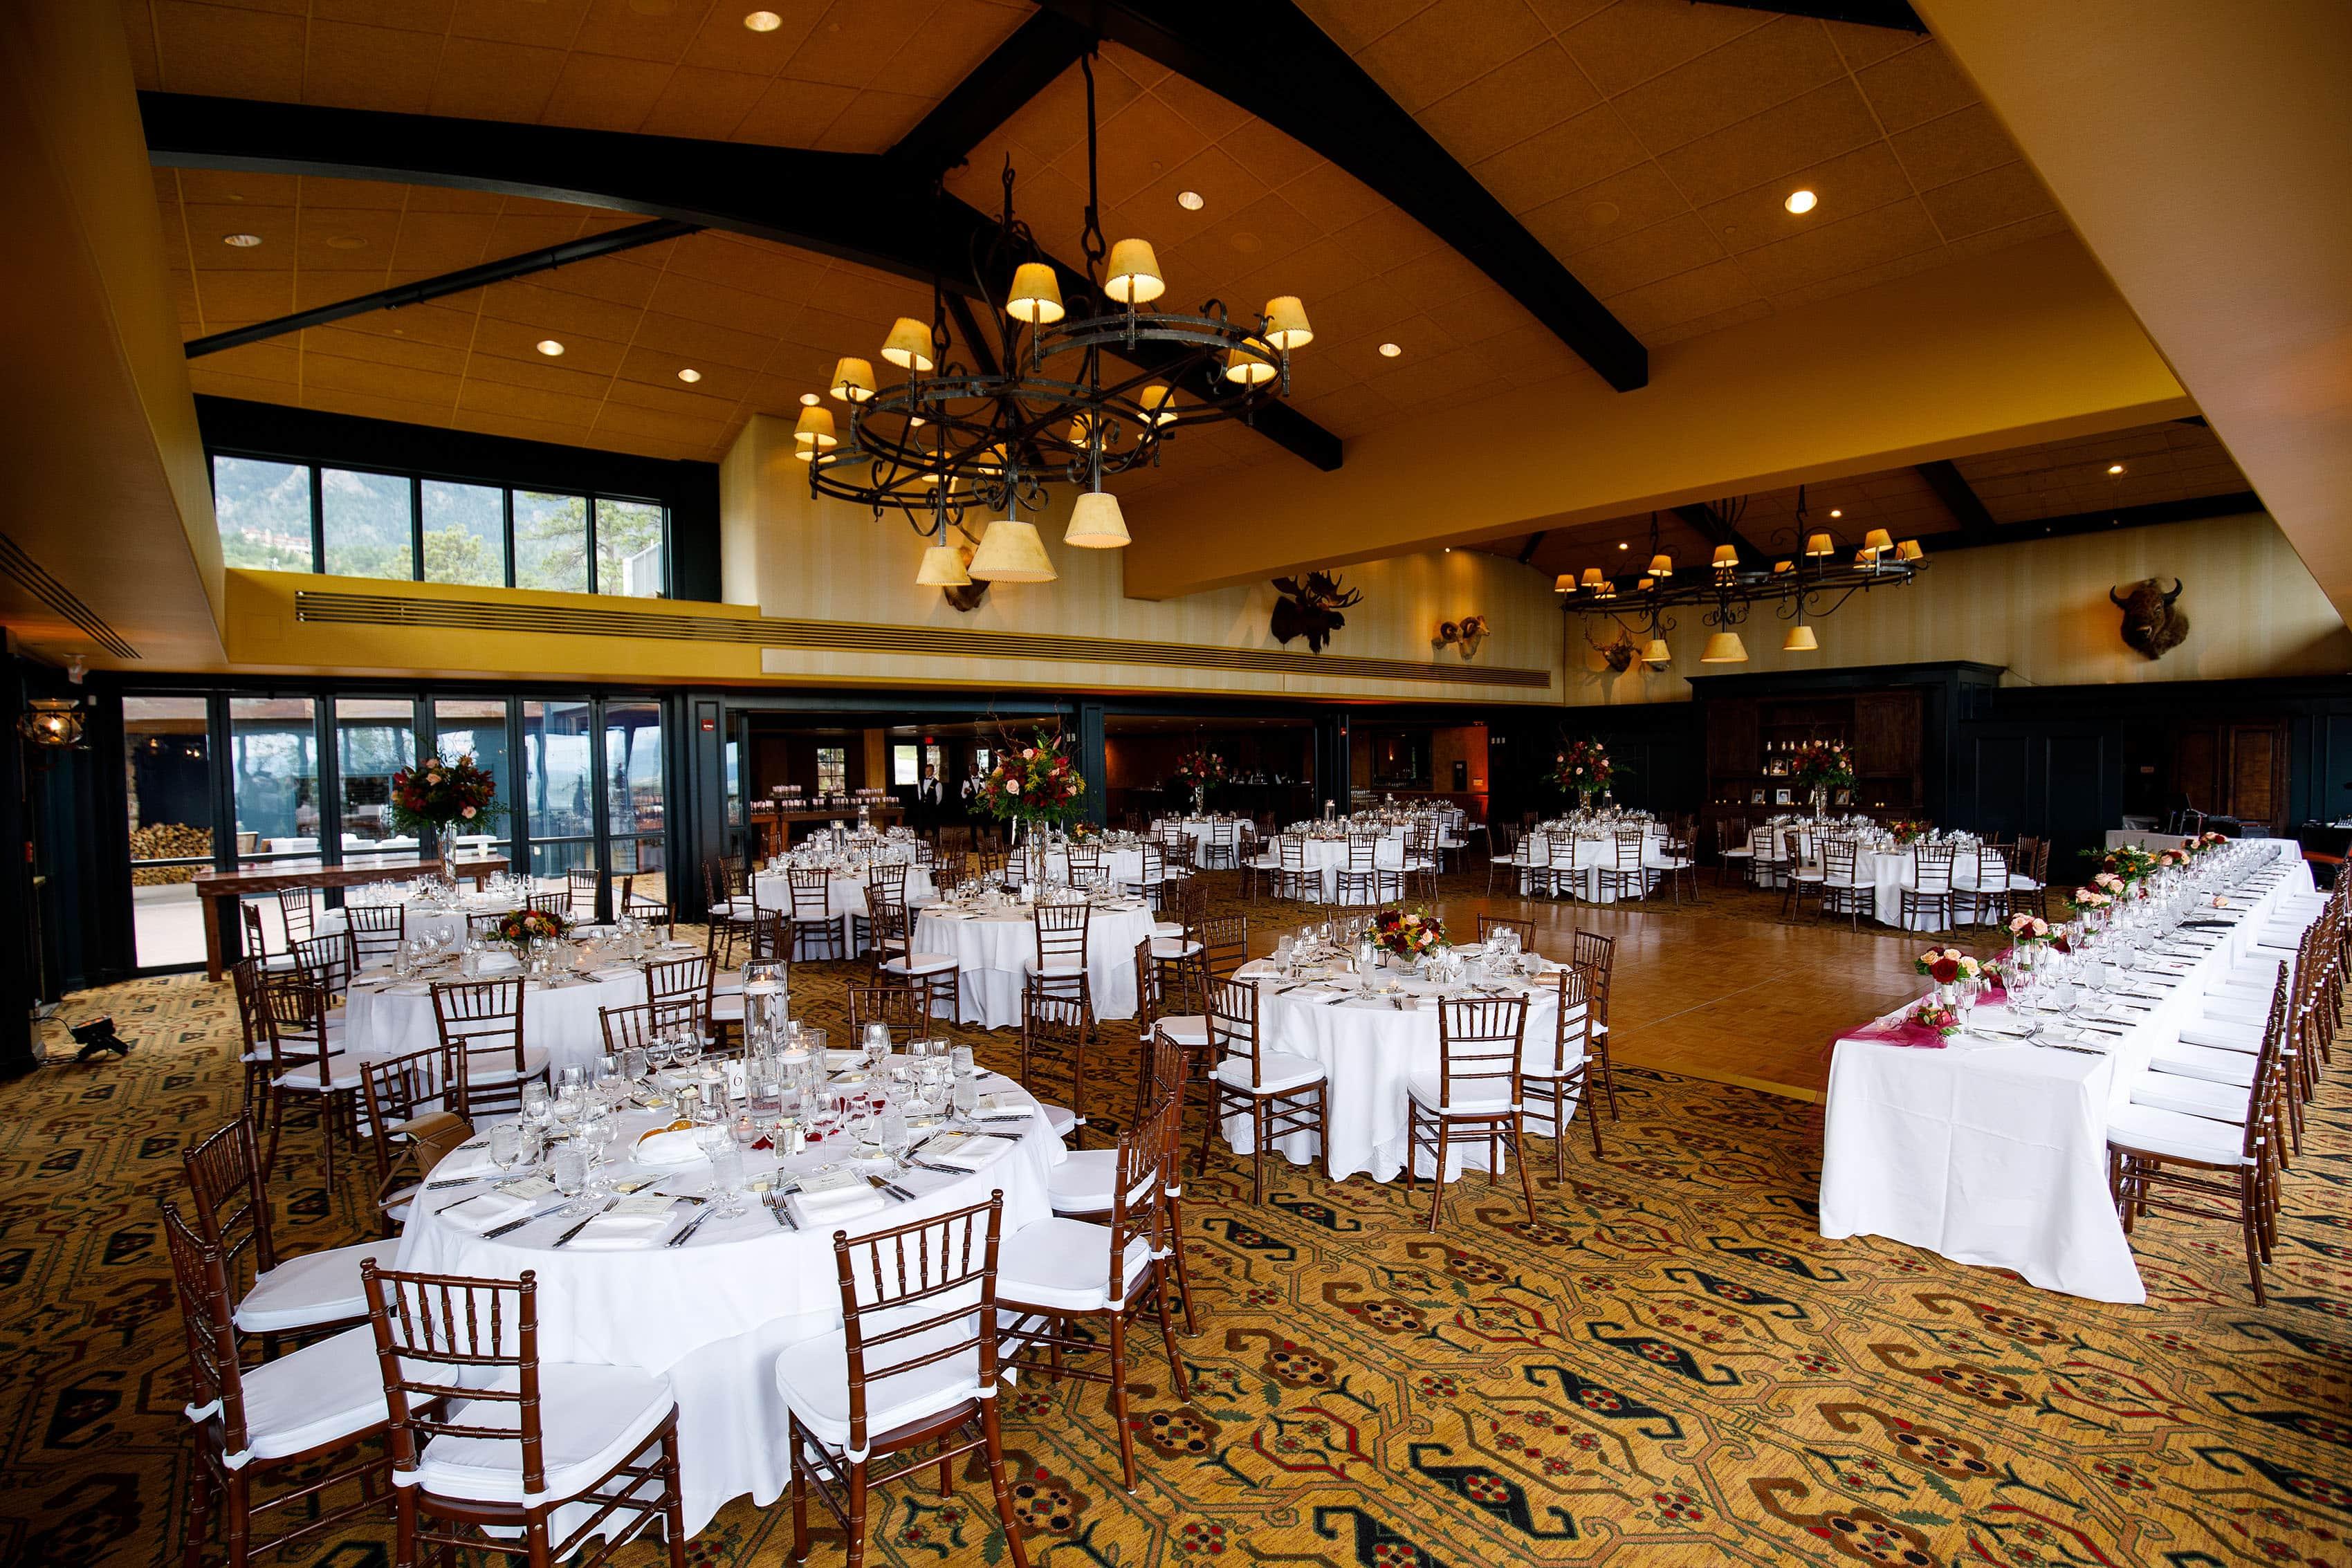 Wedding table setup at Cheyenne Lodge